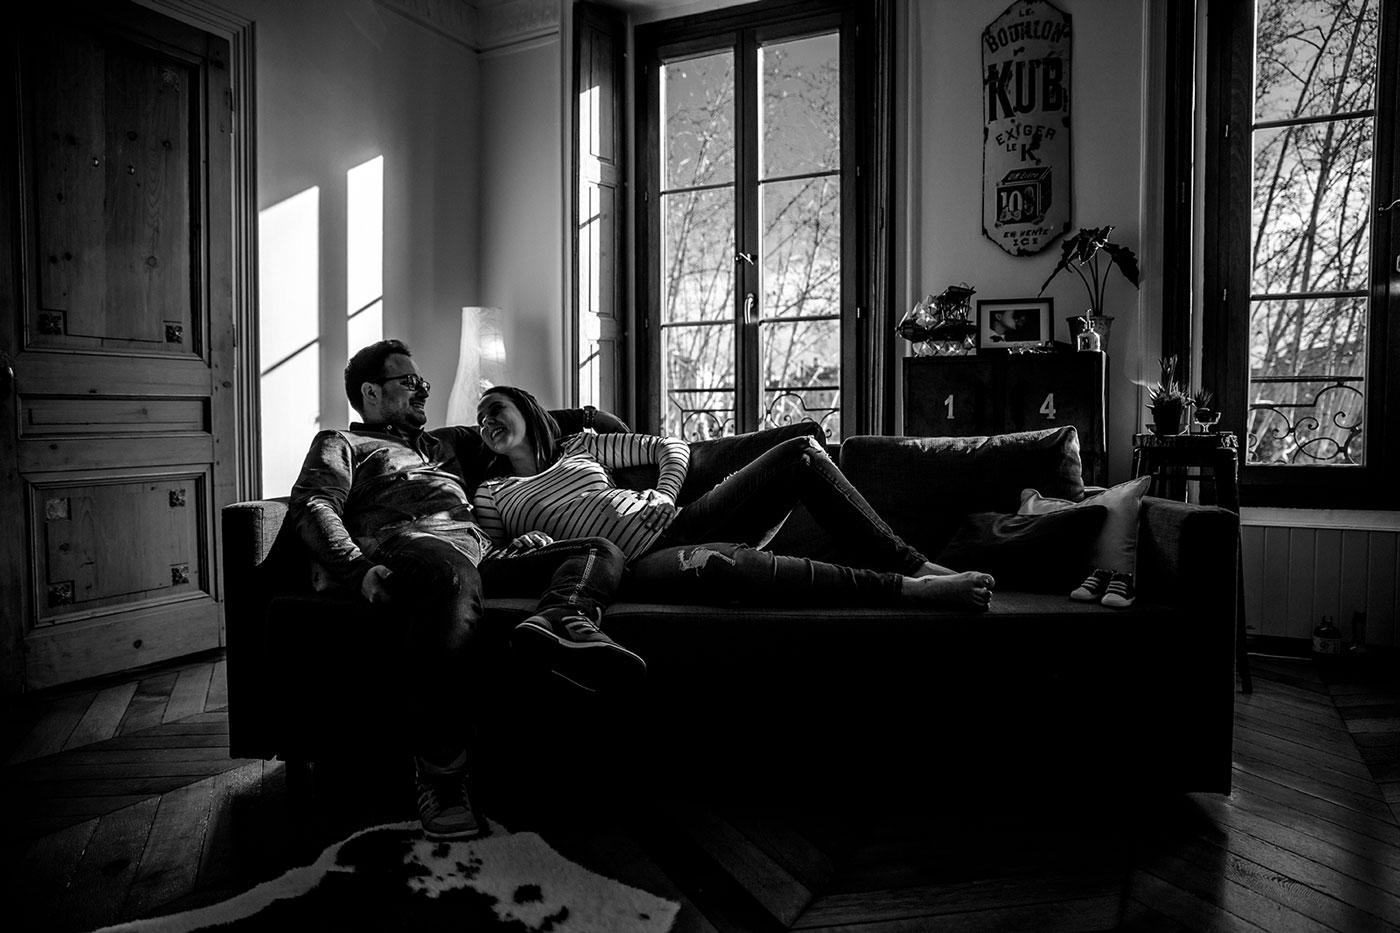 Séance photo grossesse Studio Lyon Photographe séance grossesse home studio Lyon. Photographe grossesse Lyon. Photographe nouveau né Lyon